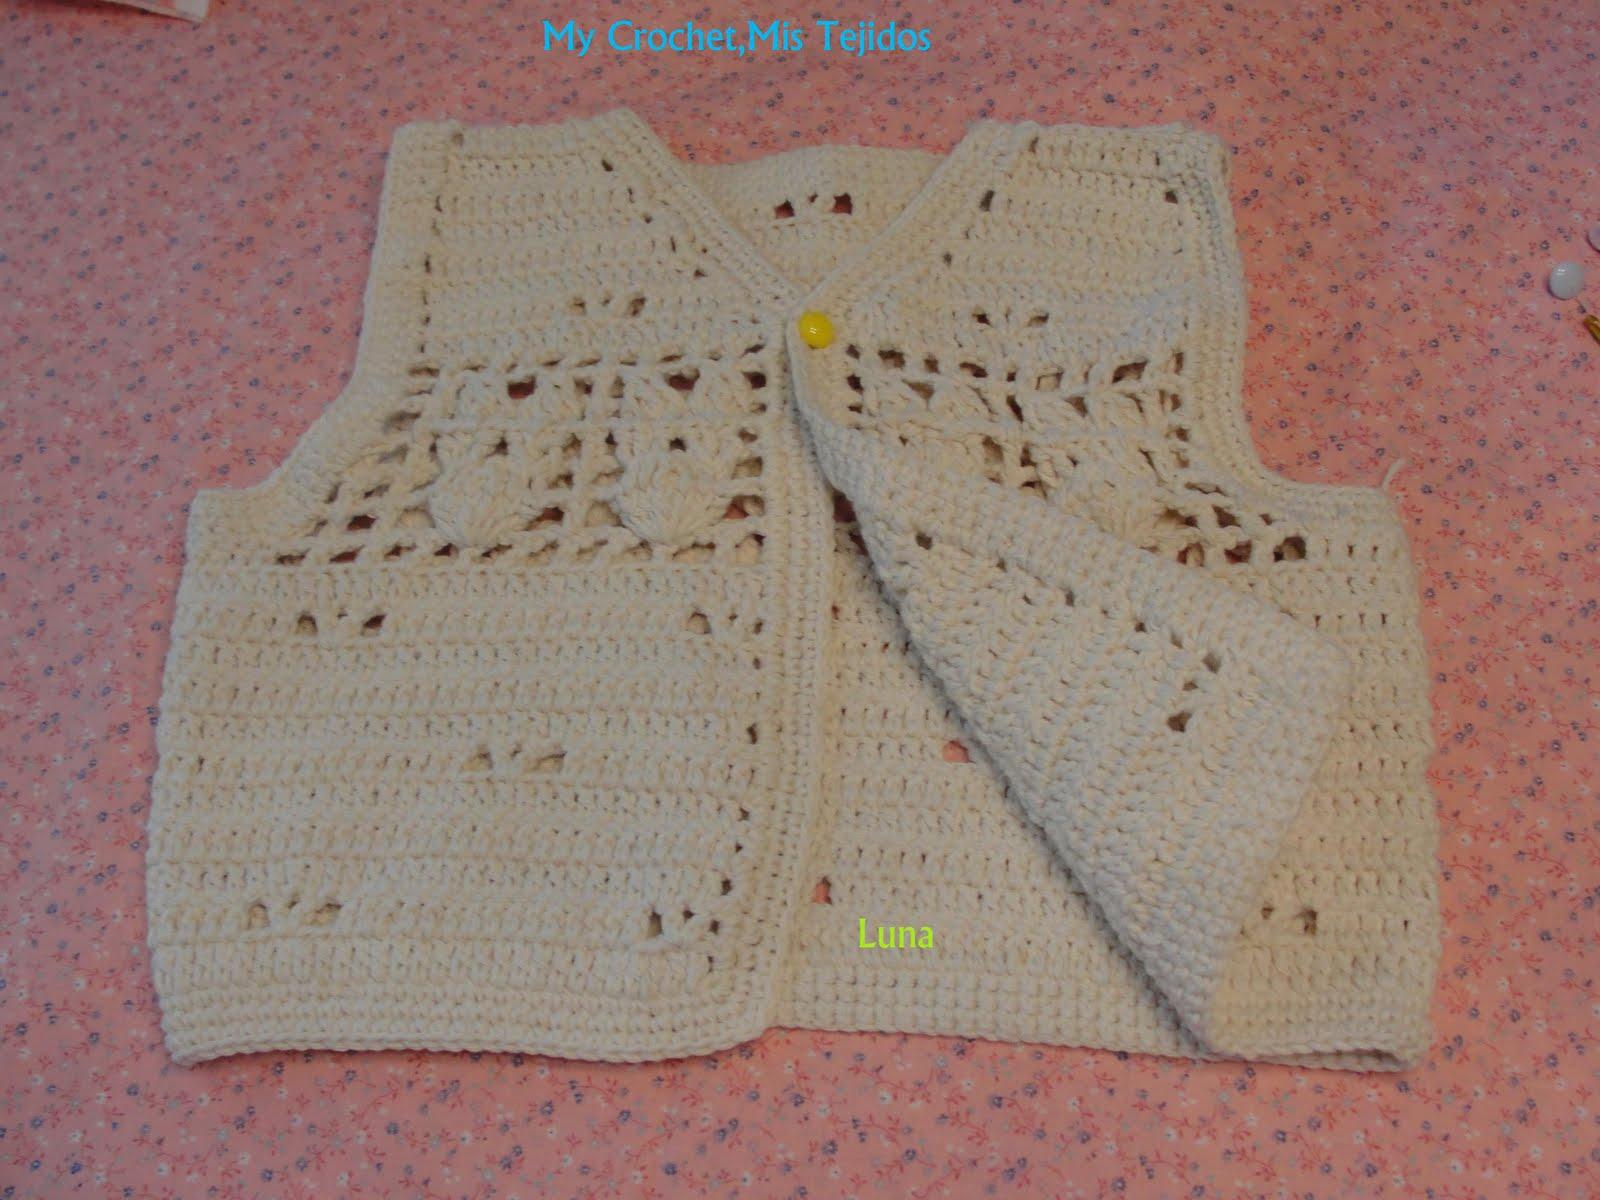 Tejiendo Con Sonia Maria De Falando De Crochet   Share The Knownledge